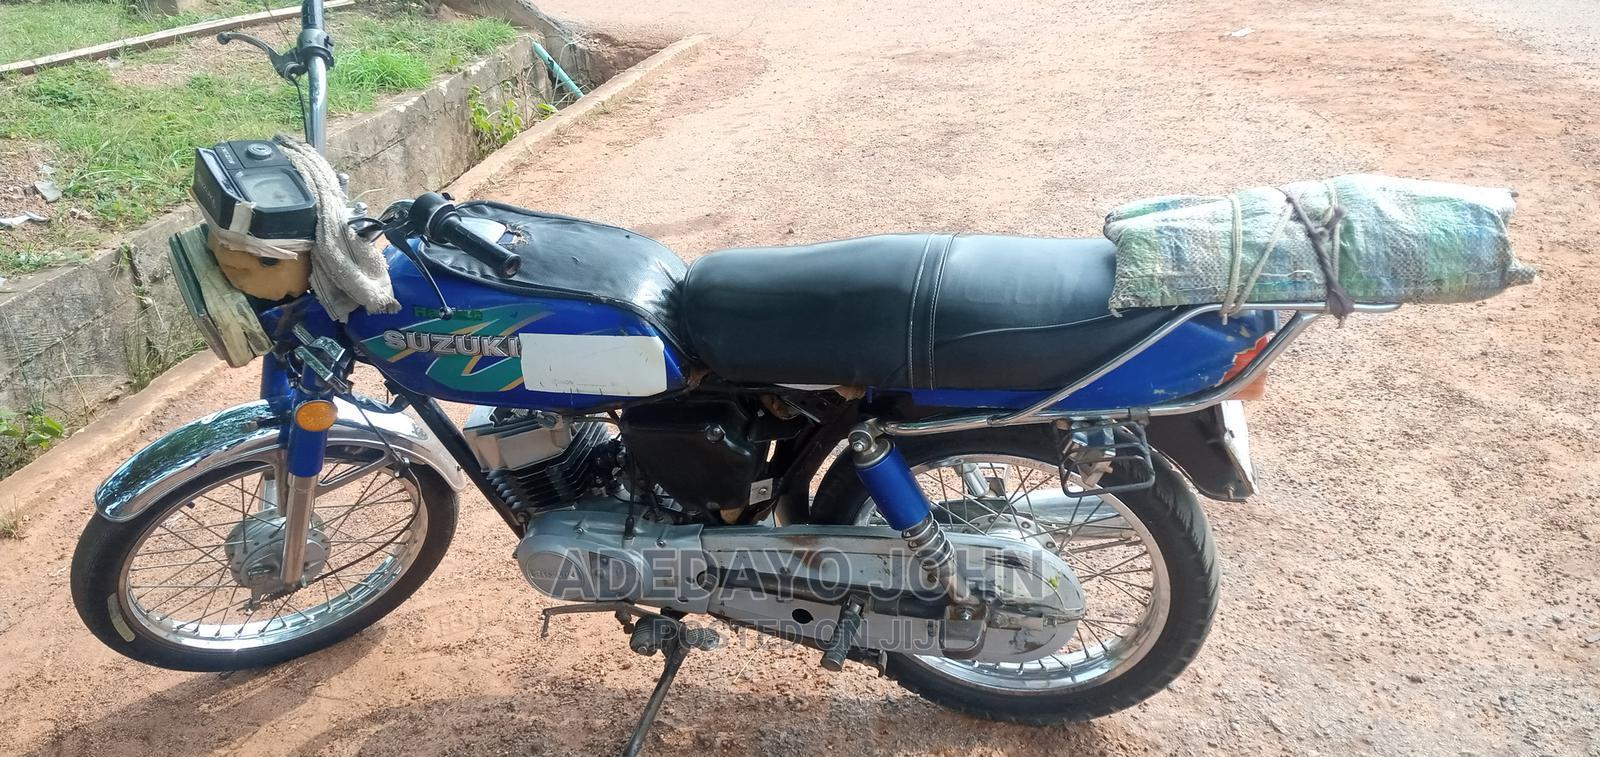 Archive: Suzuki Bike 2007 Blue